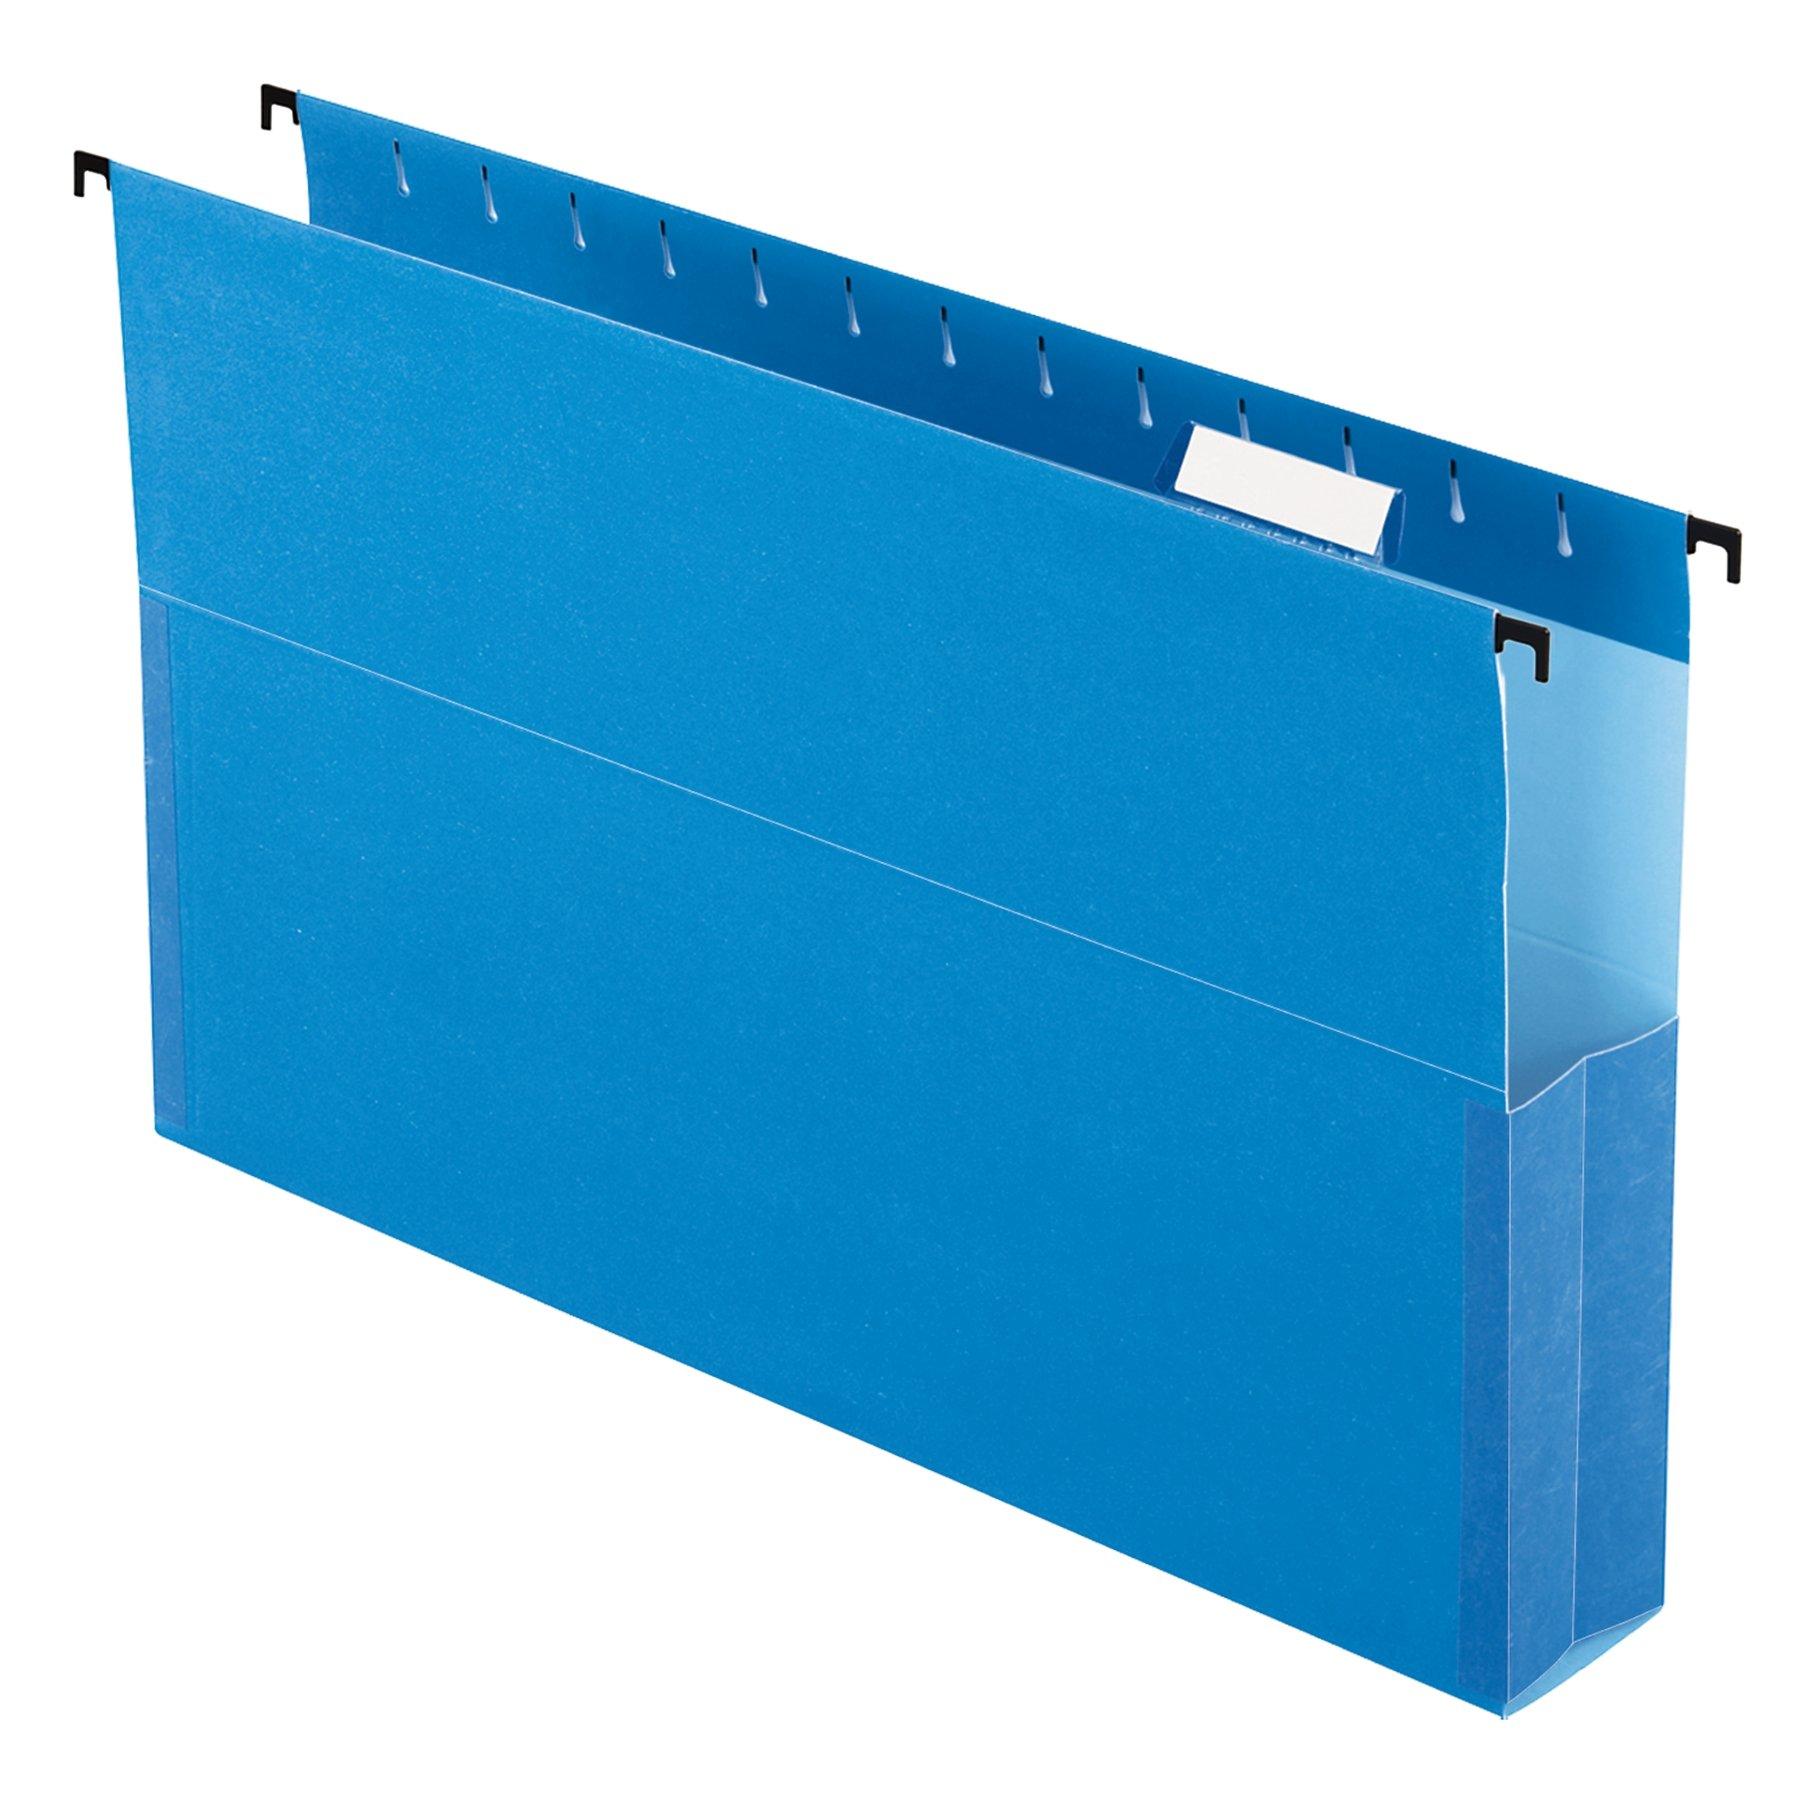 Pendaflex SureHook Reinforced Hanging Box File, 2'', Legal, Blue, 1/5 Cut, 25 per box (59302EE) by Pendaflex